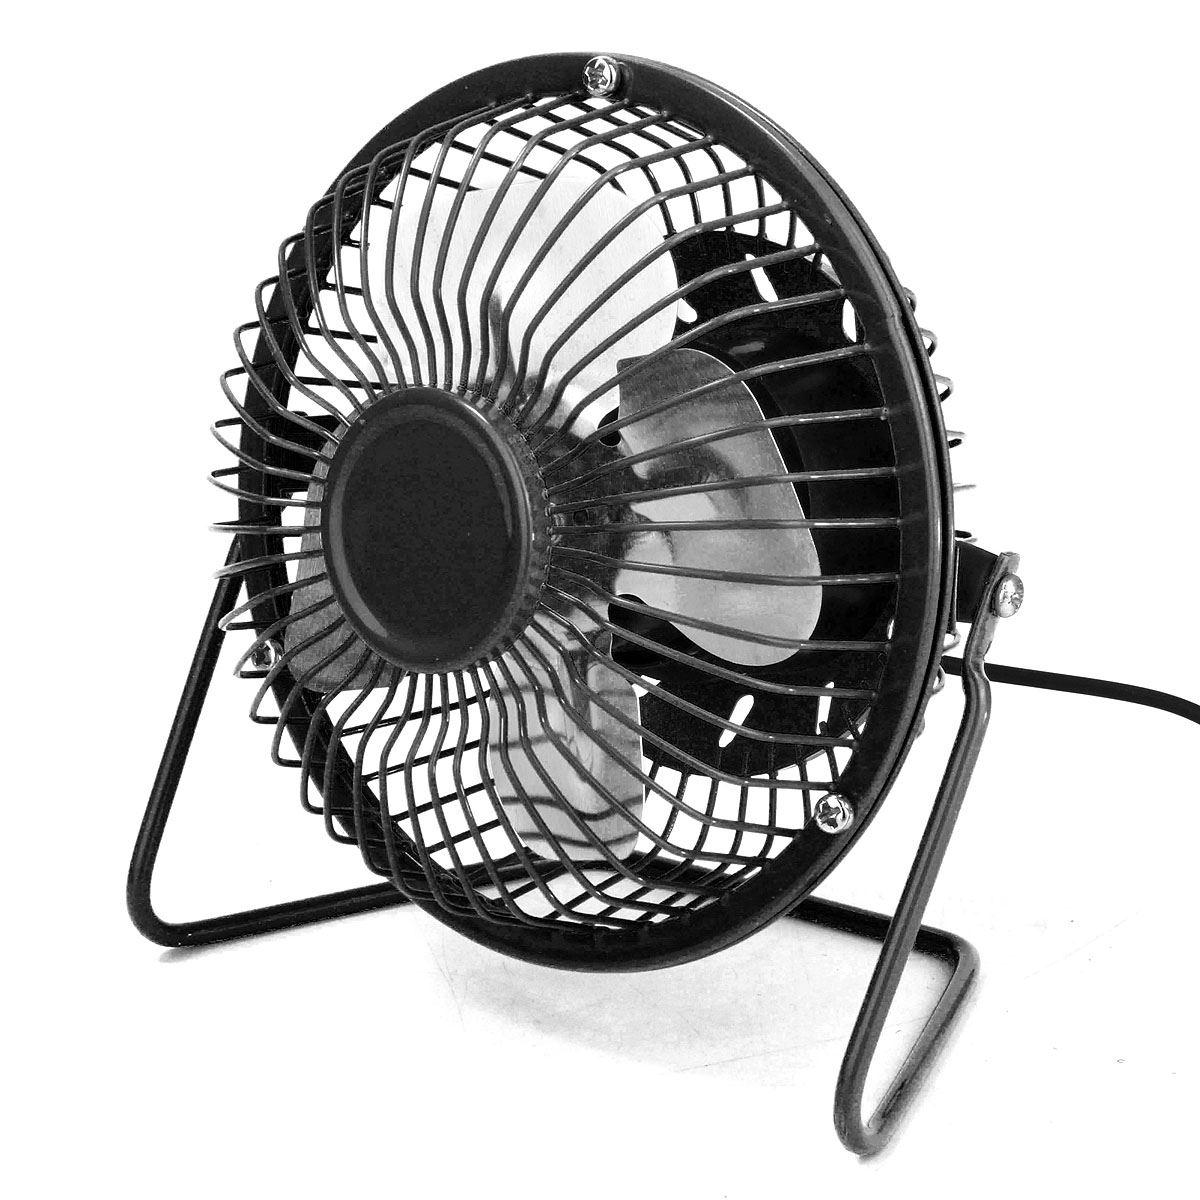 Portable Usb Fan Powered Escritorio Cooling Desk Mini  Fan Computadora Laptop Pc 1